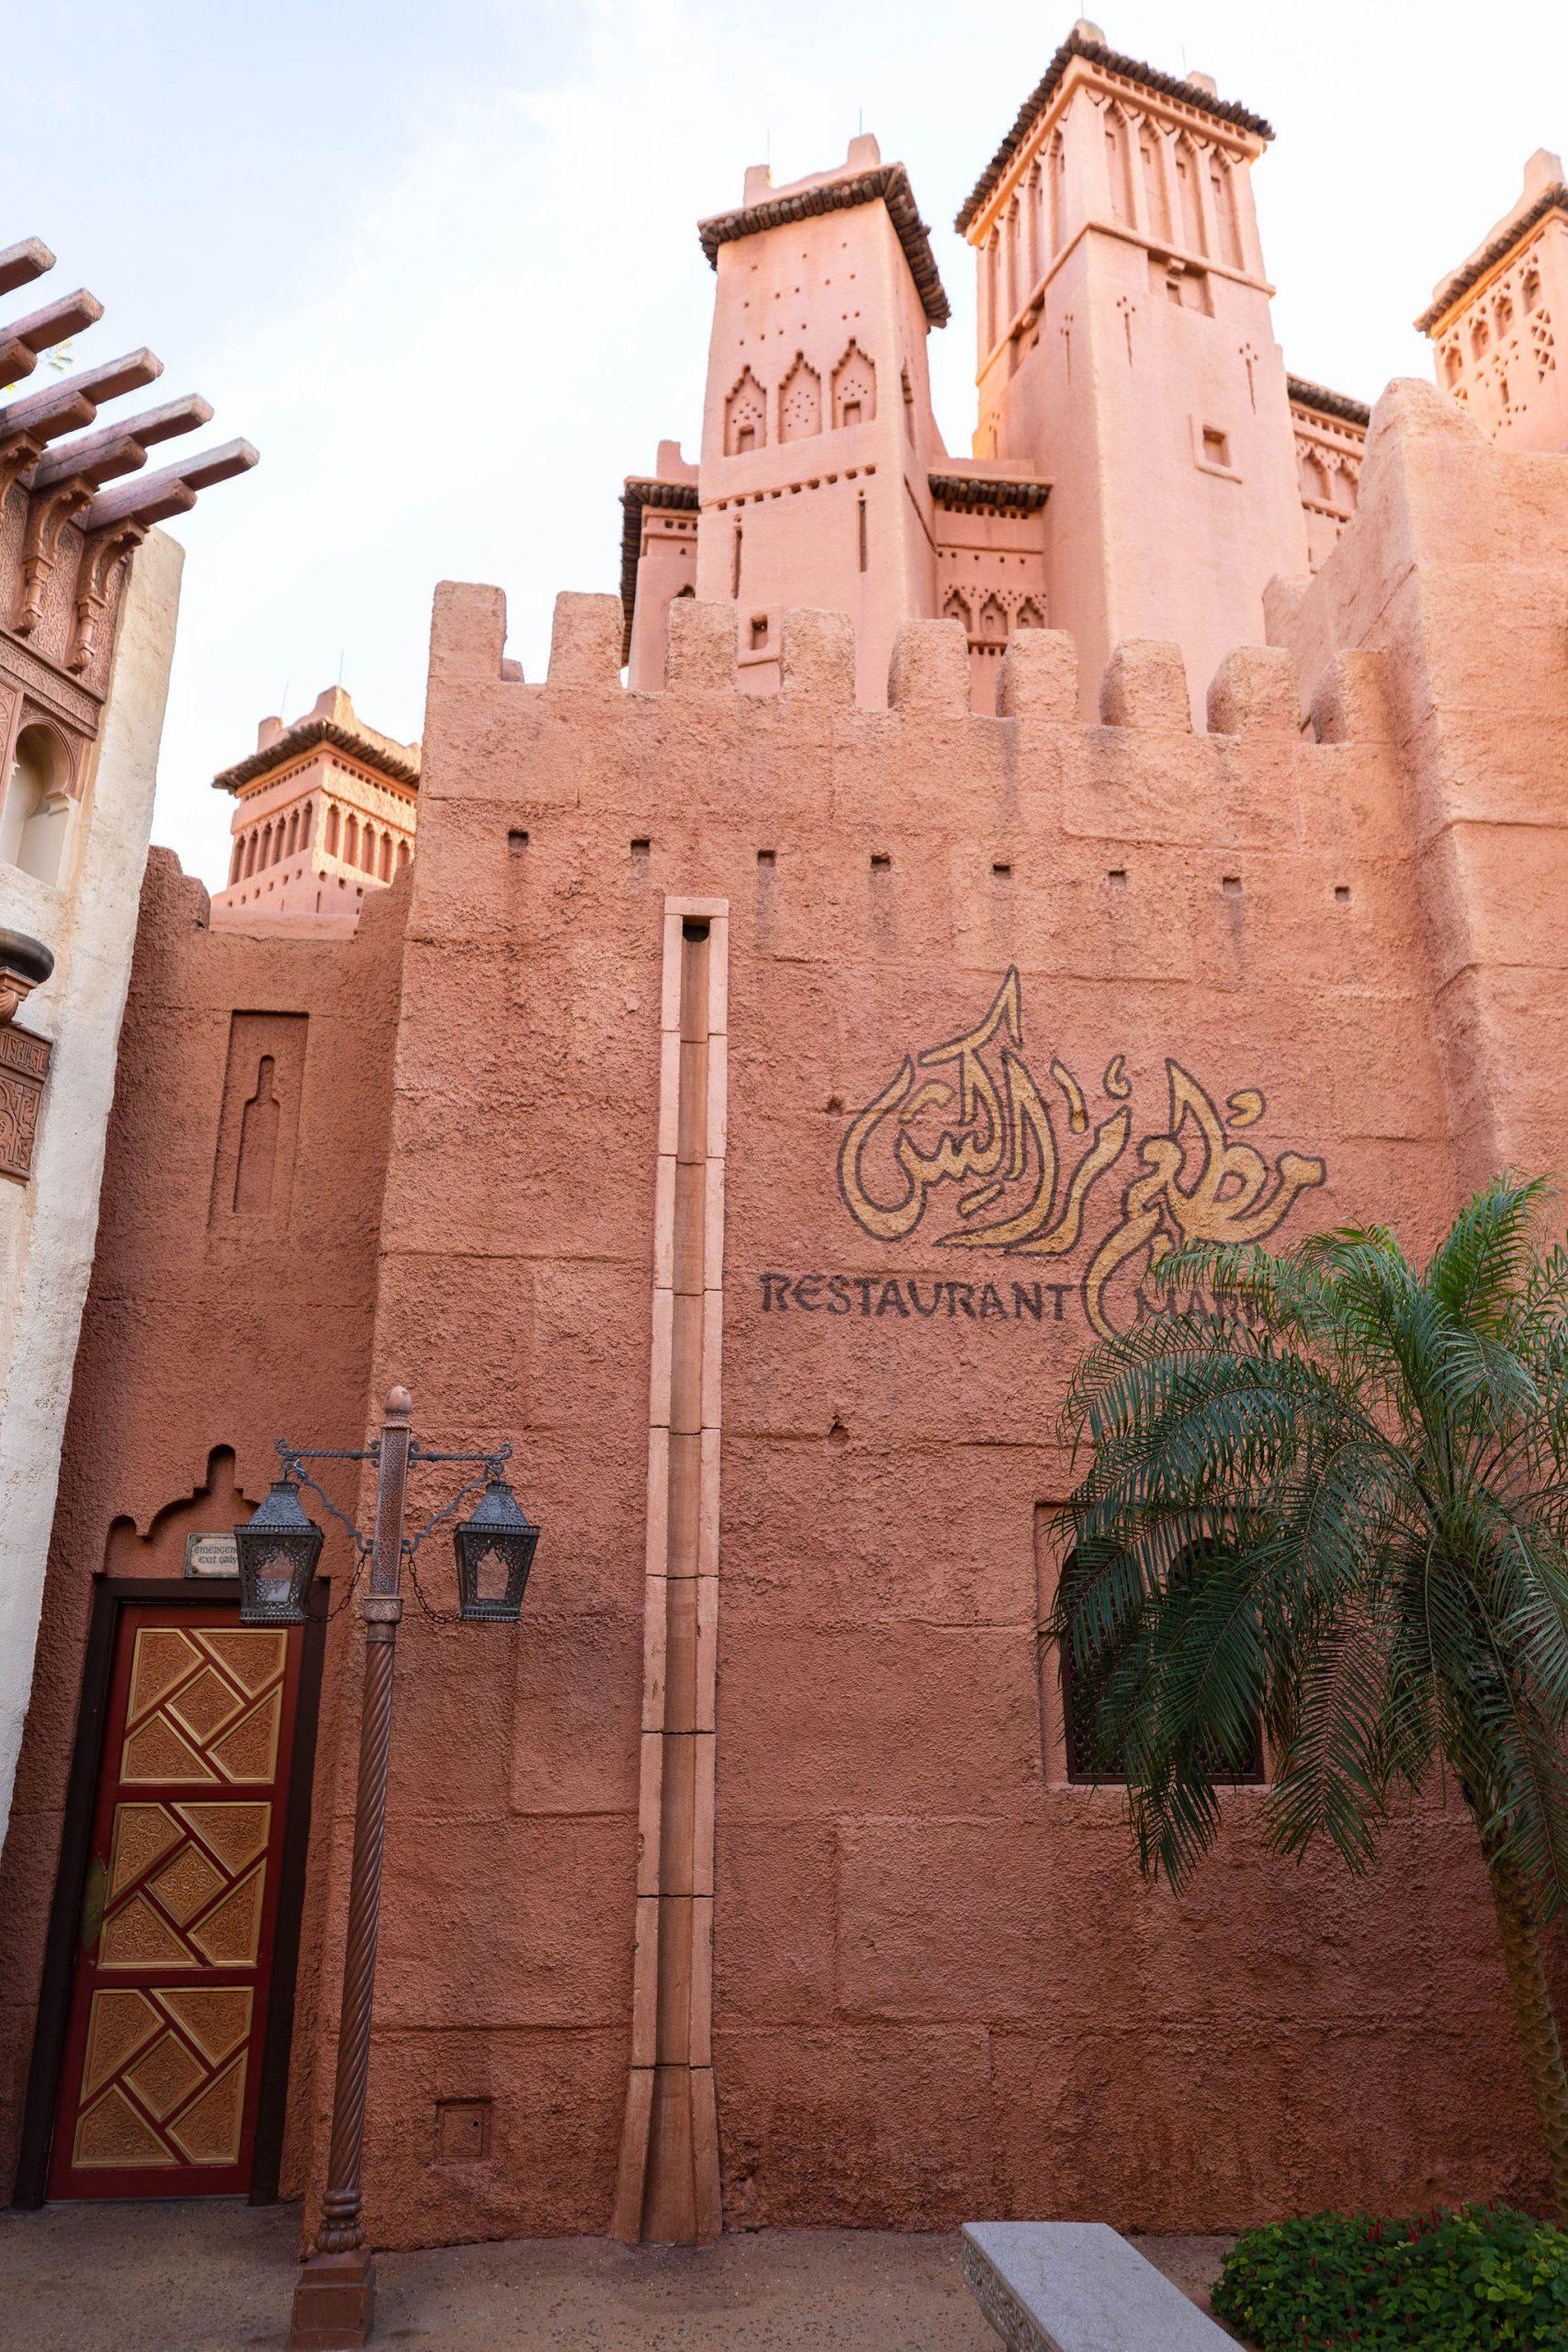 Morocco Pavillion at Epcot Inside Walt Disney World Orlando Florida Photographed by Annie Fairfax